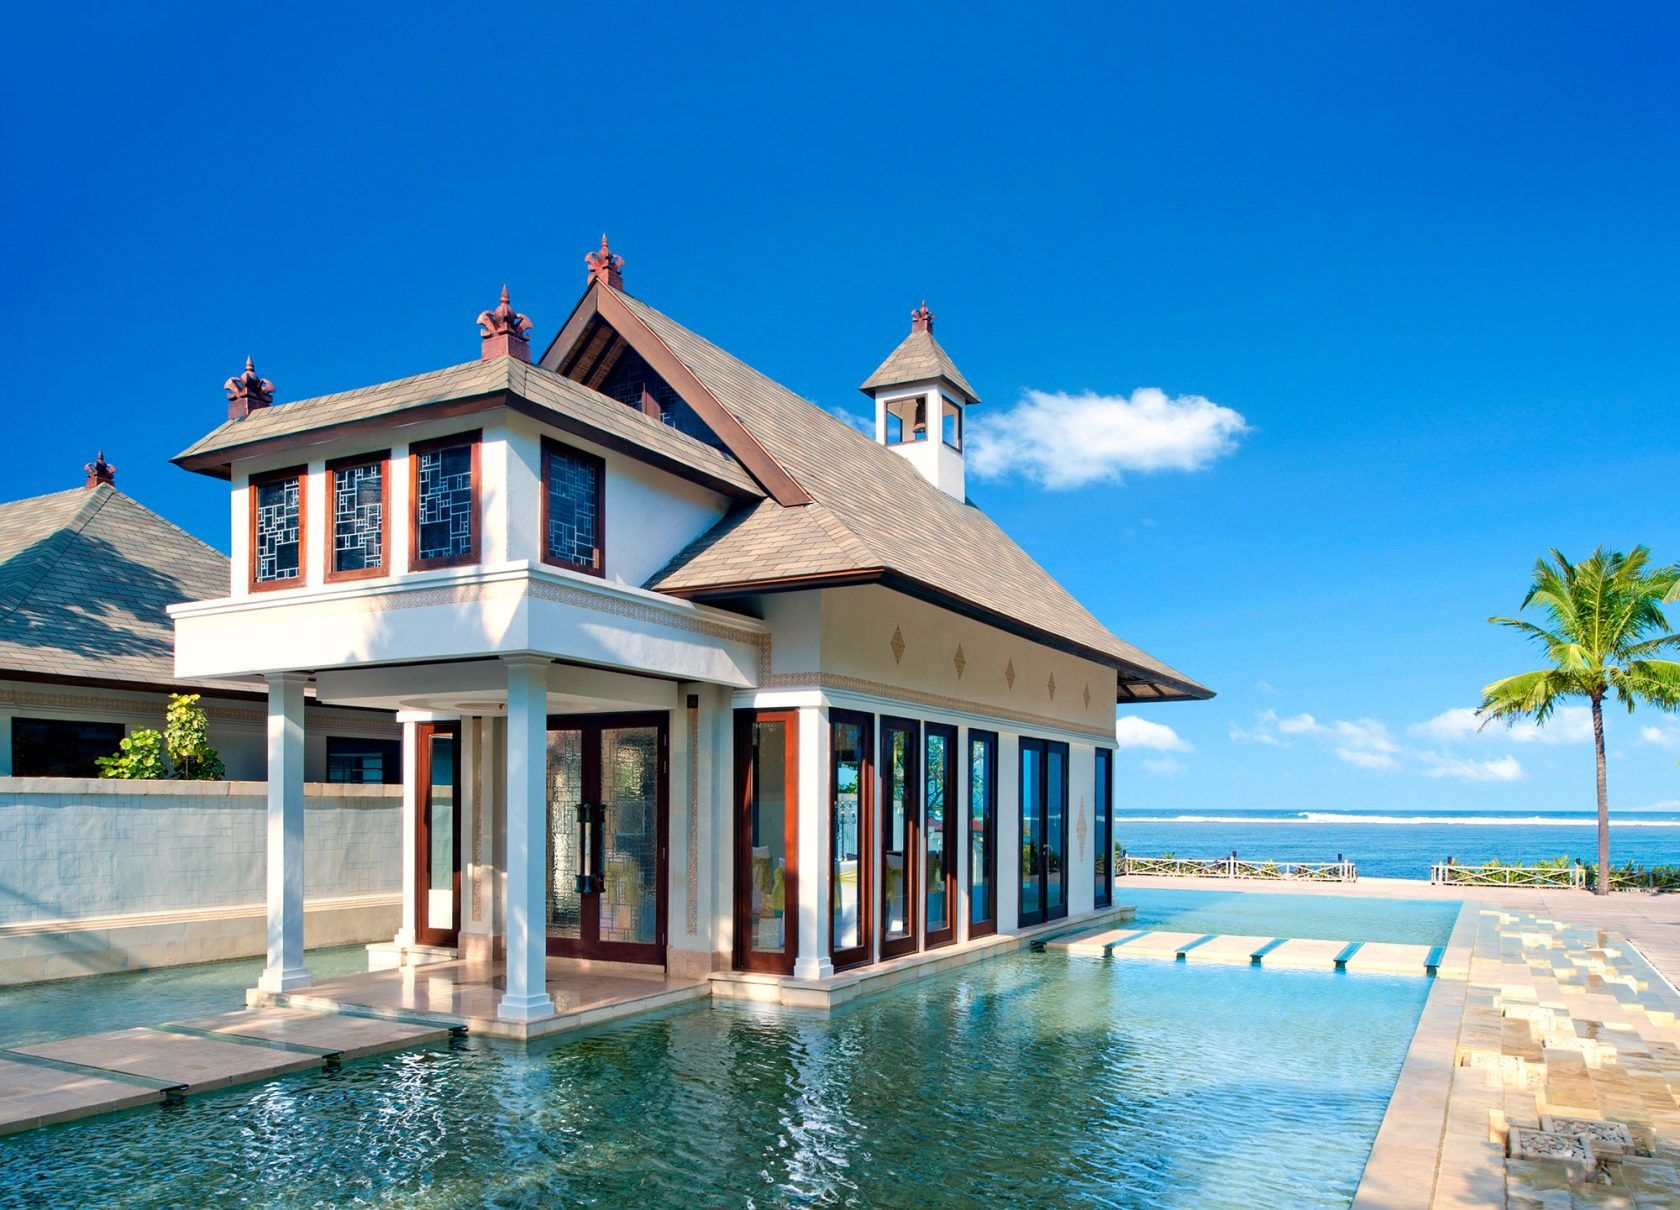 The St. Regis Bali The Oceanfront Cloud Ninr Chapel